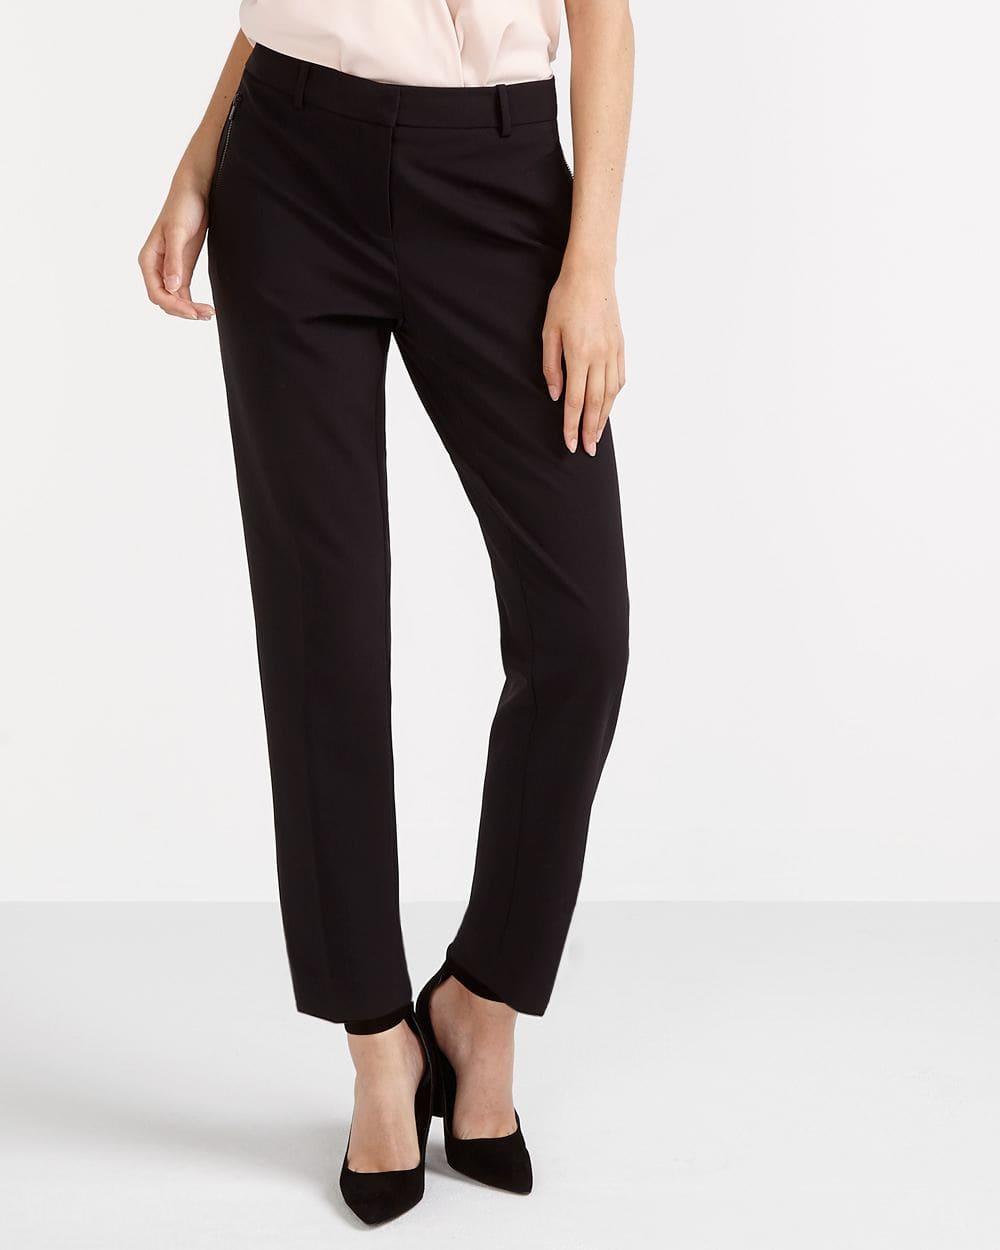 Pantalon uni à jambe étroite Willow & Thread